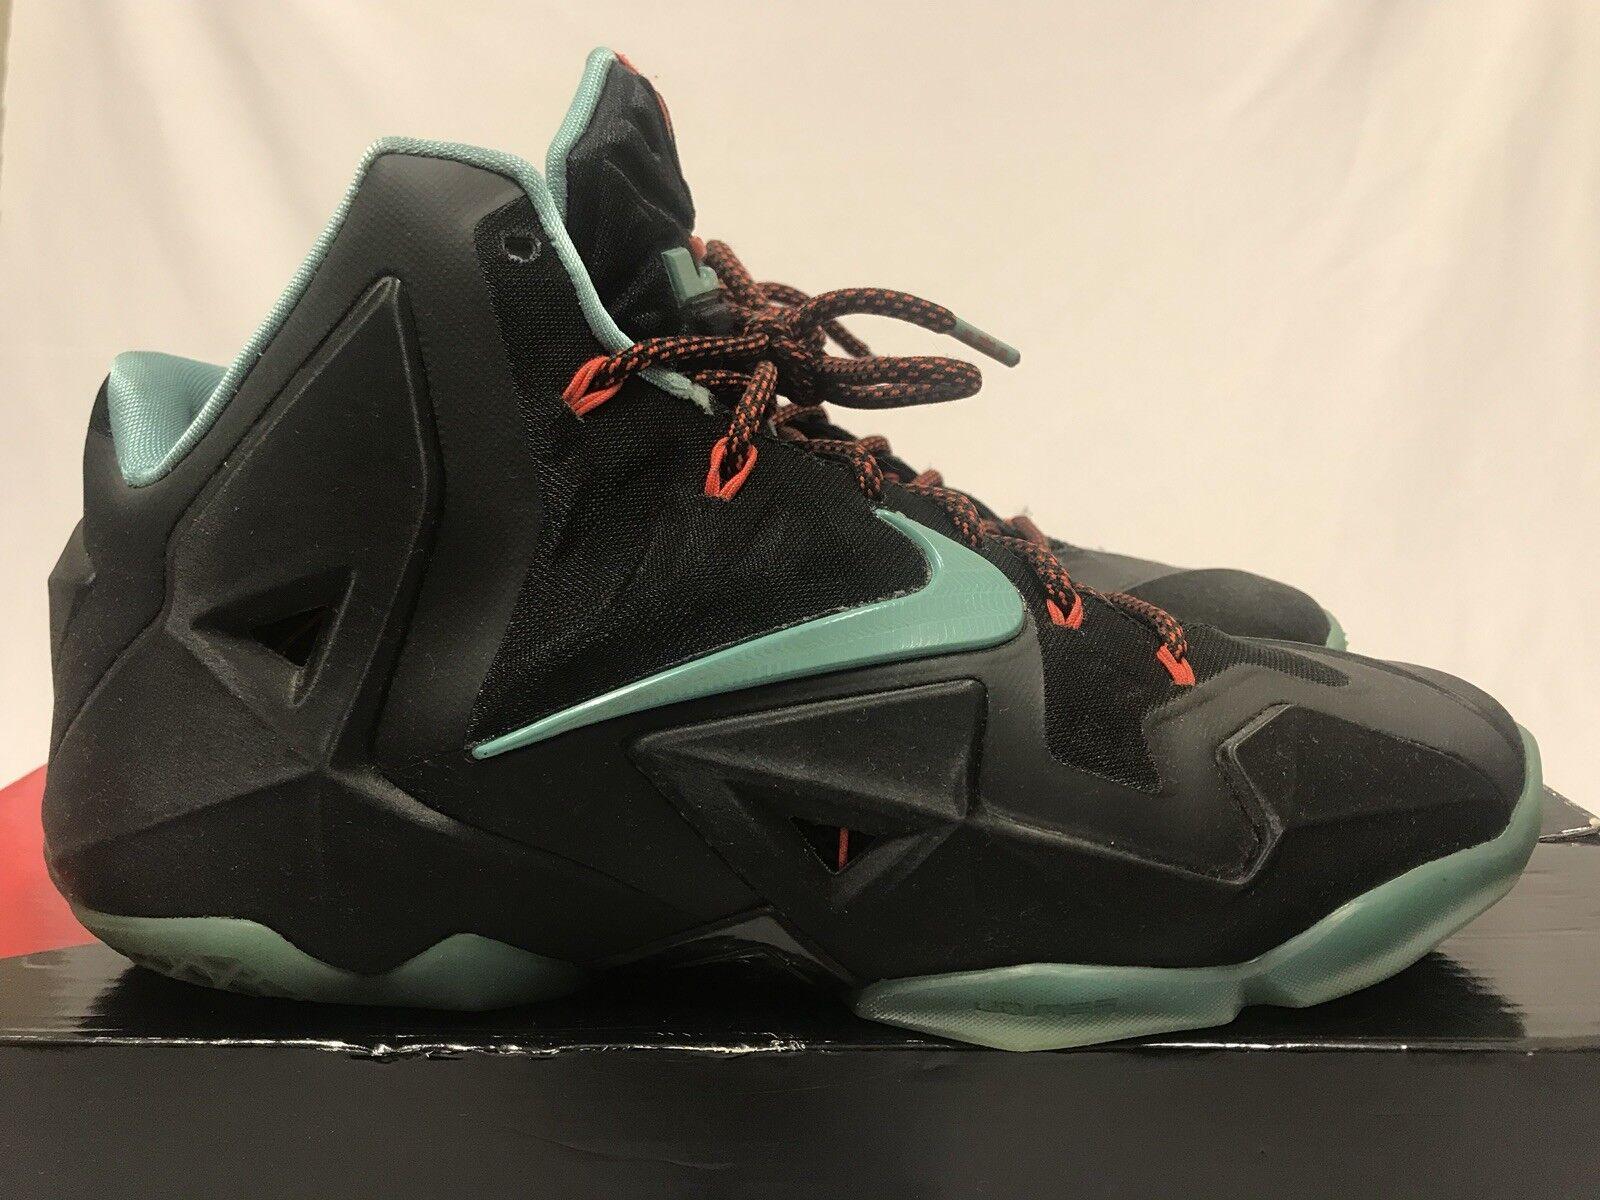 Nike LEBRON XI 11 Size 10.5 BLK JADE GREEN CRIMSON 616175-004